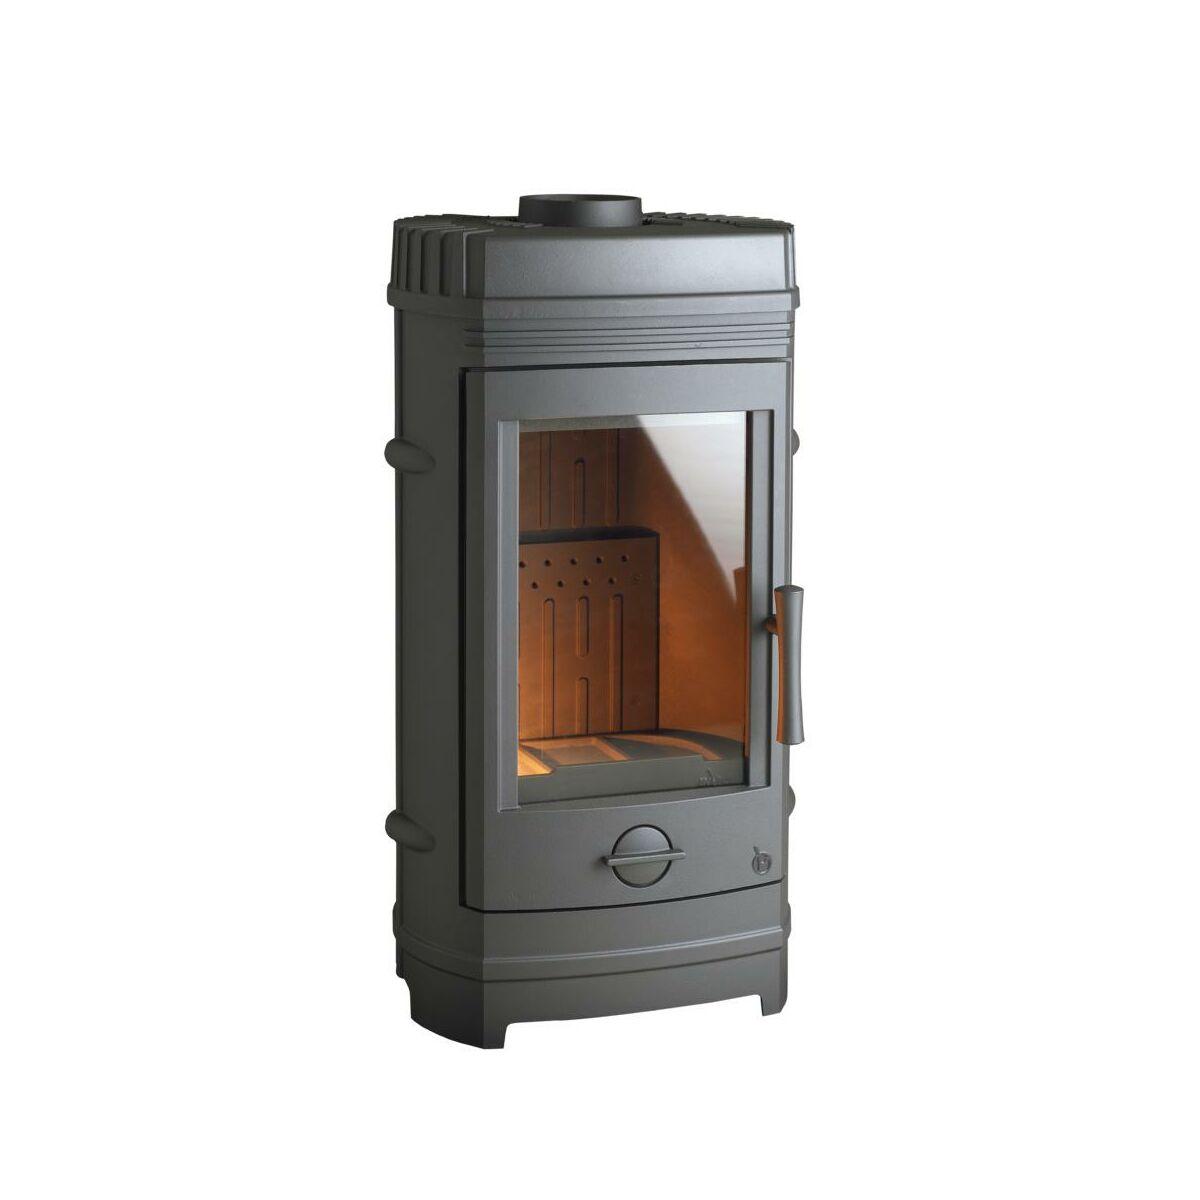 piec kominkowy cassine invicta piece kominkowe w. Black Bedroom Furniture Sets. Home Design Ideas